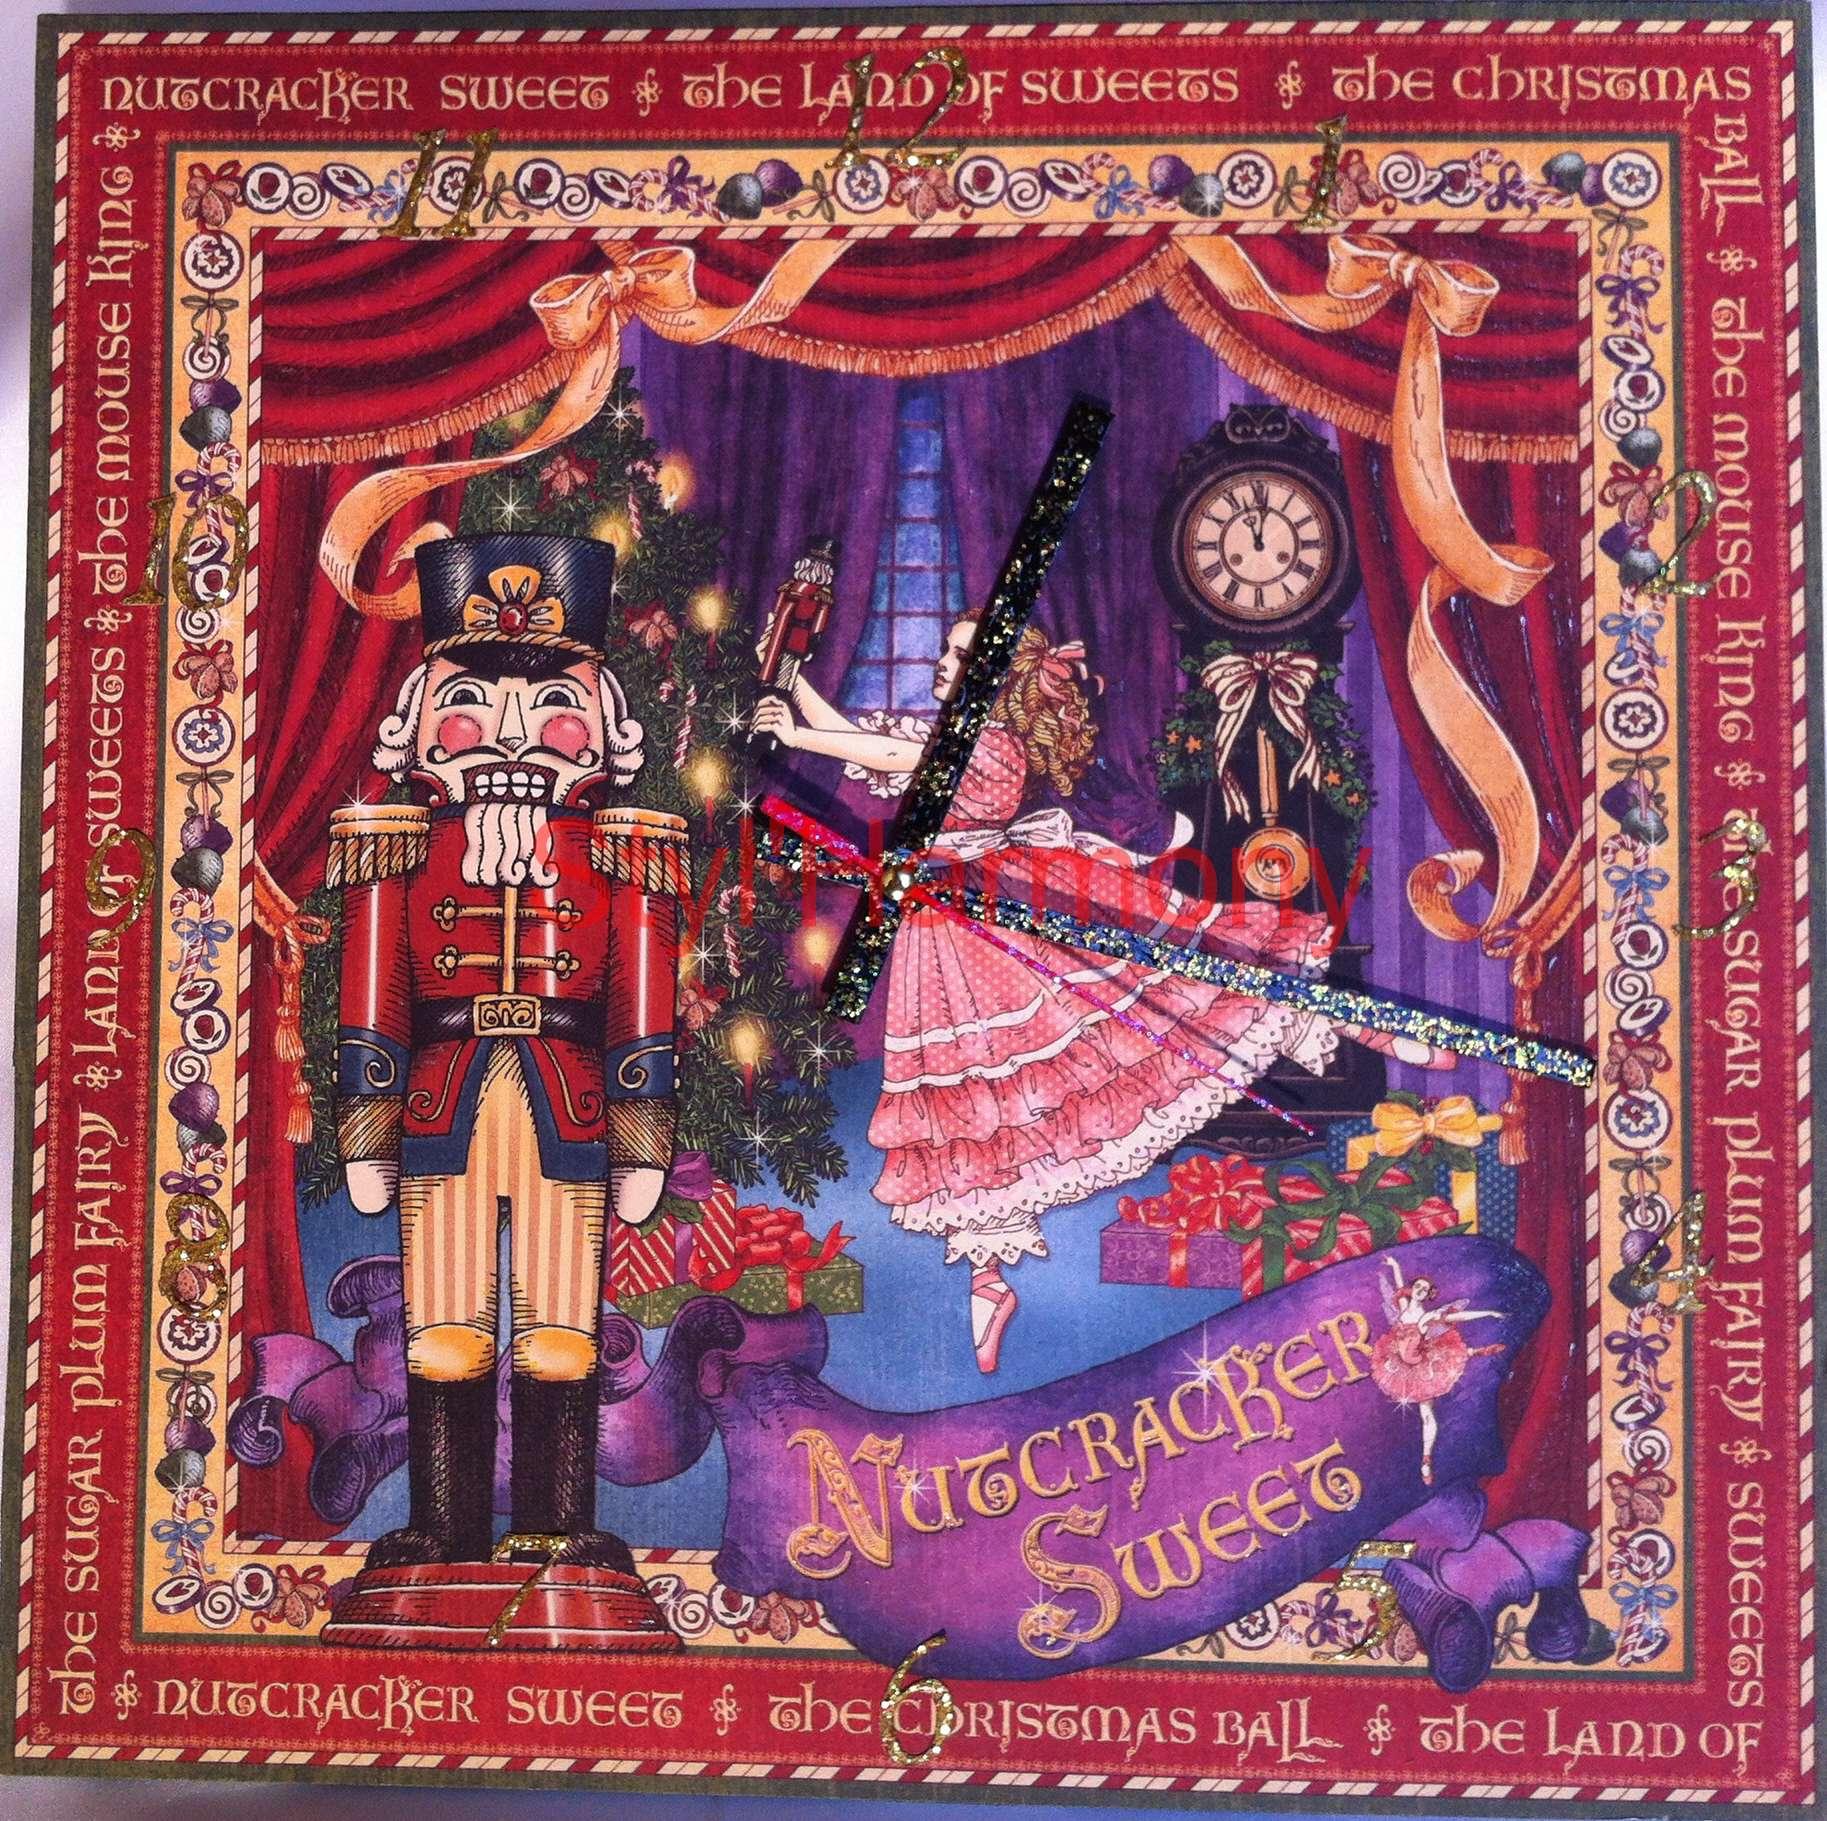 horloge-noel-christmas-nutcracker-rouge-carree-carre-